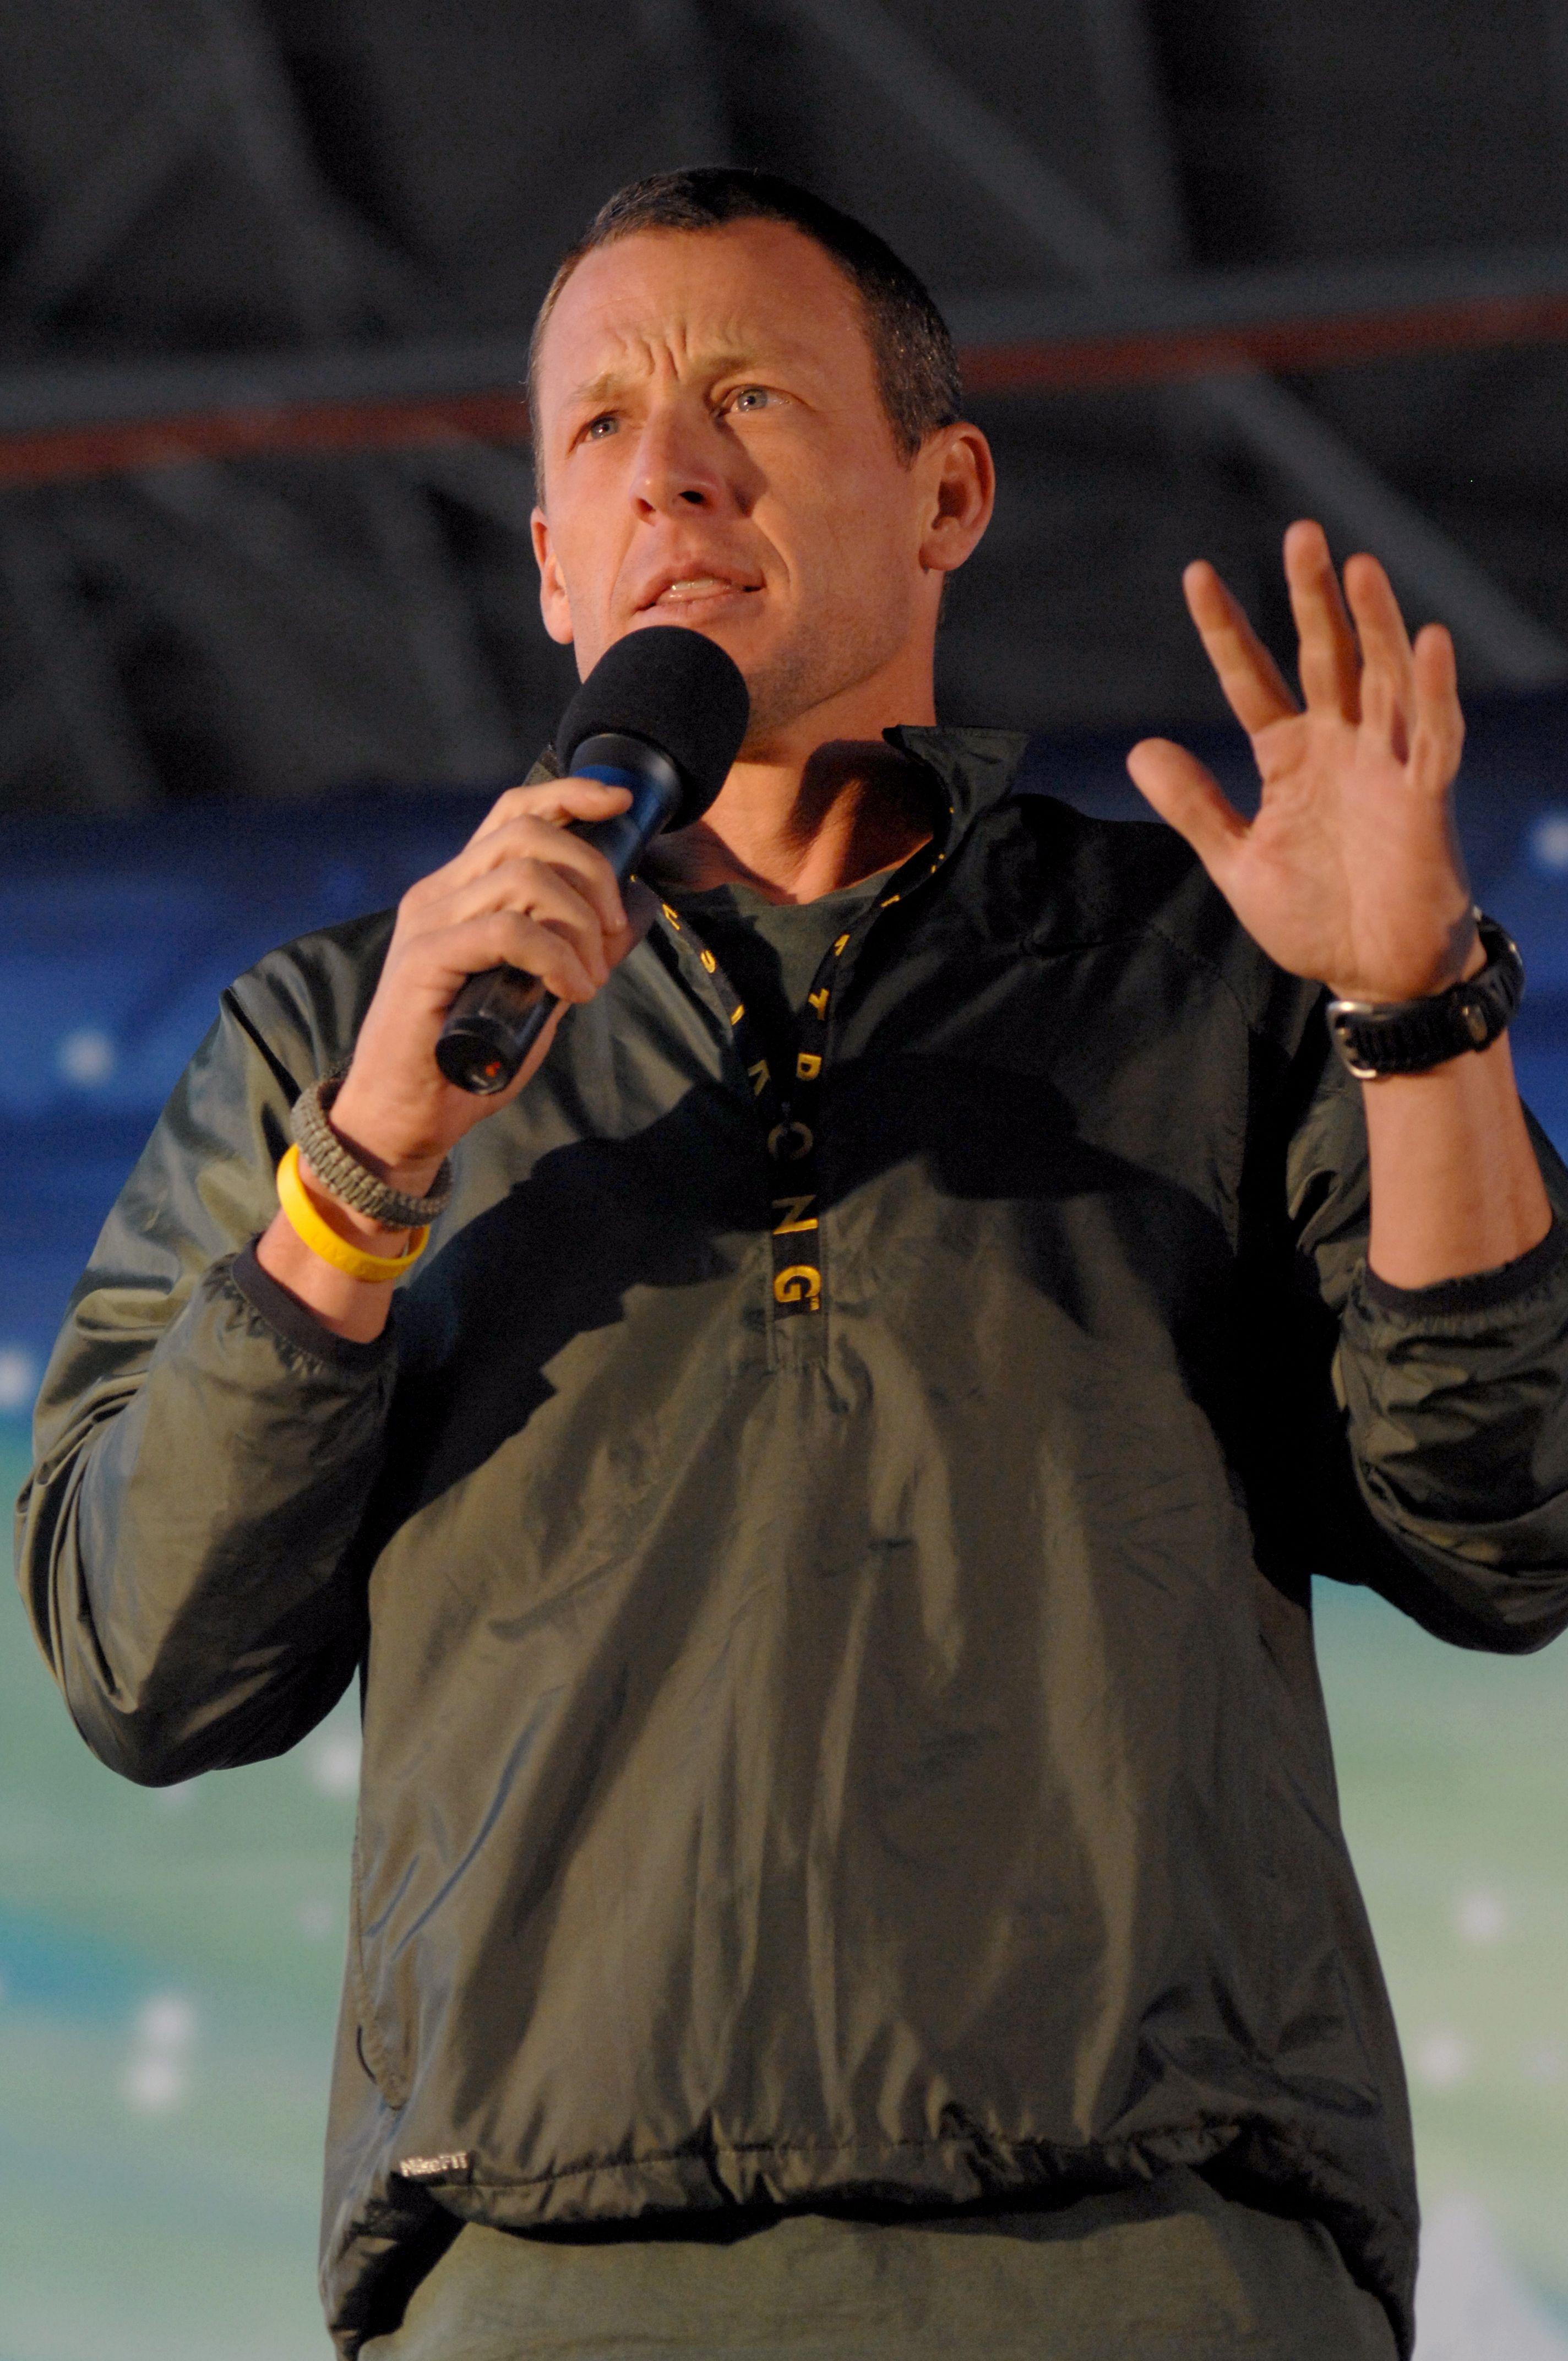 Lance Armstrong CC